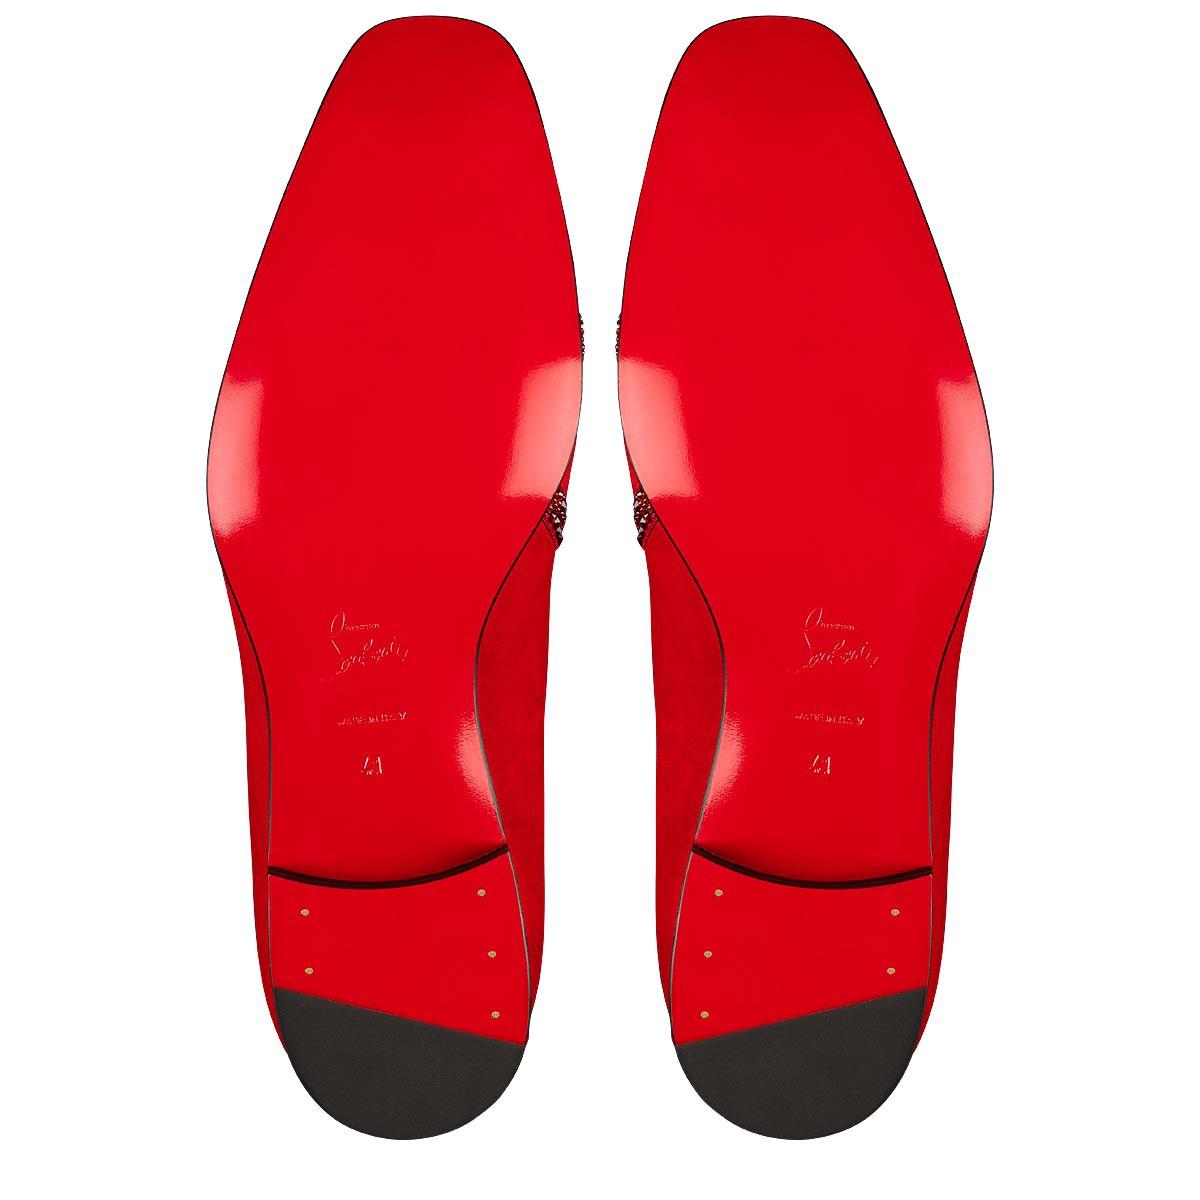 Shoes - Dandylove Strass Flat - Christian Louboutin